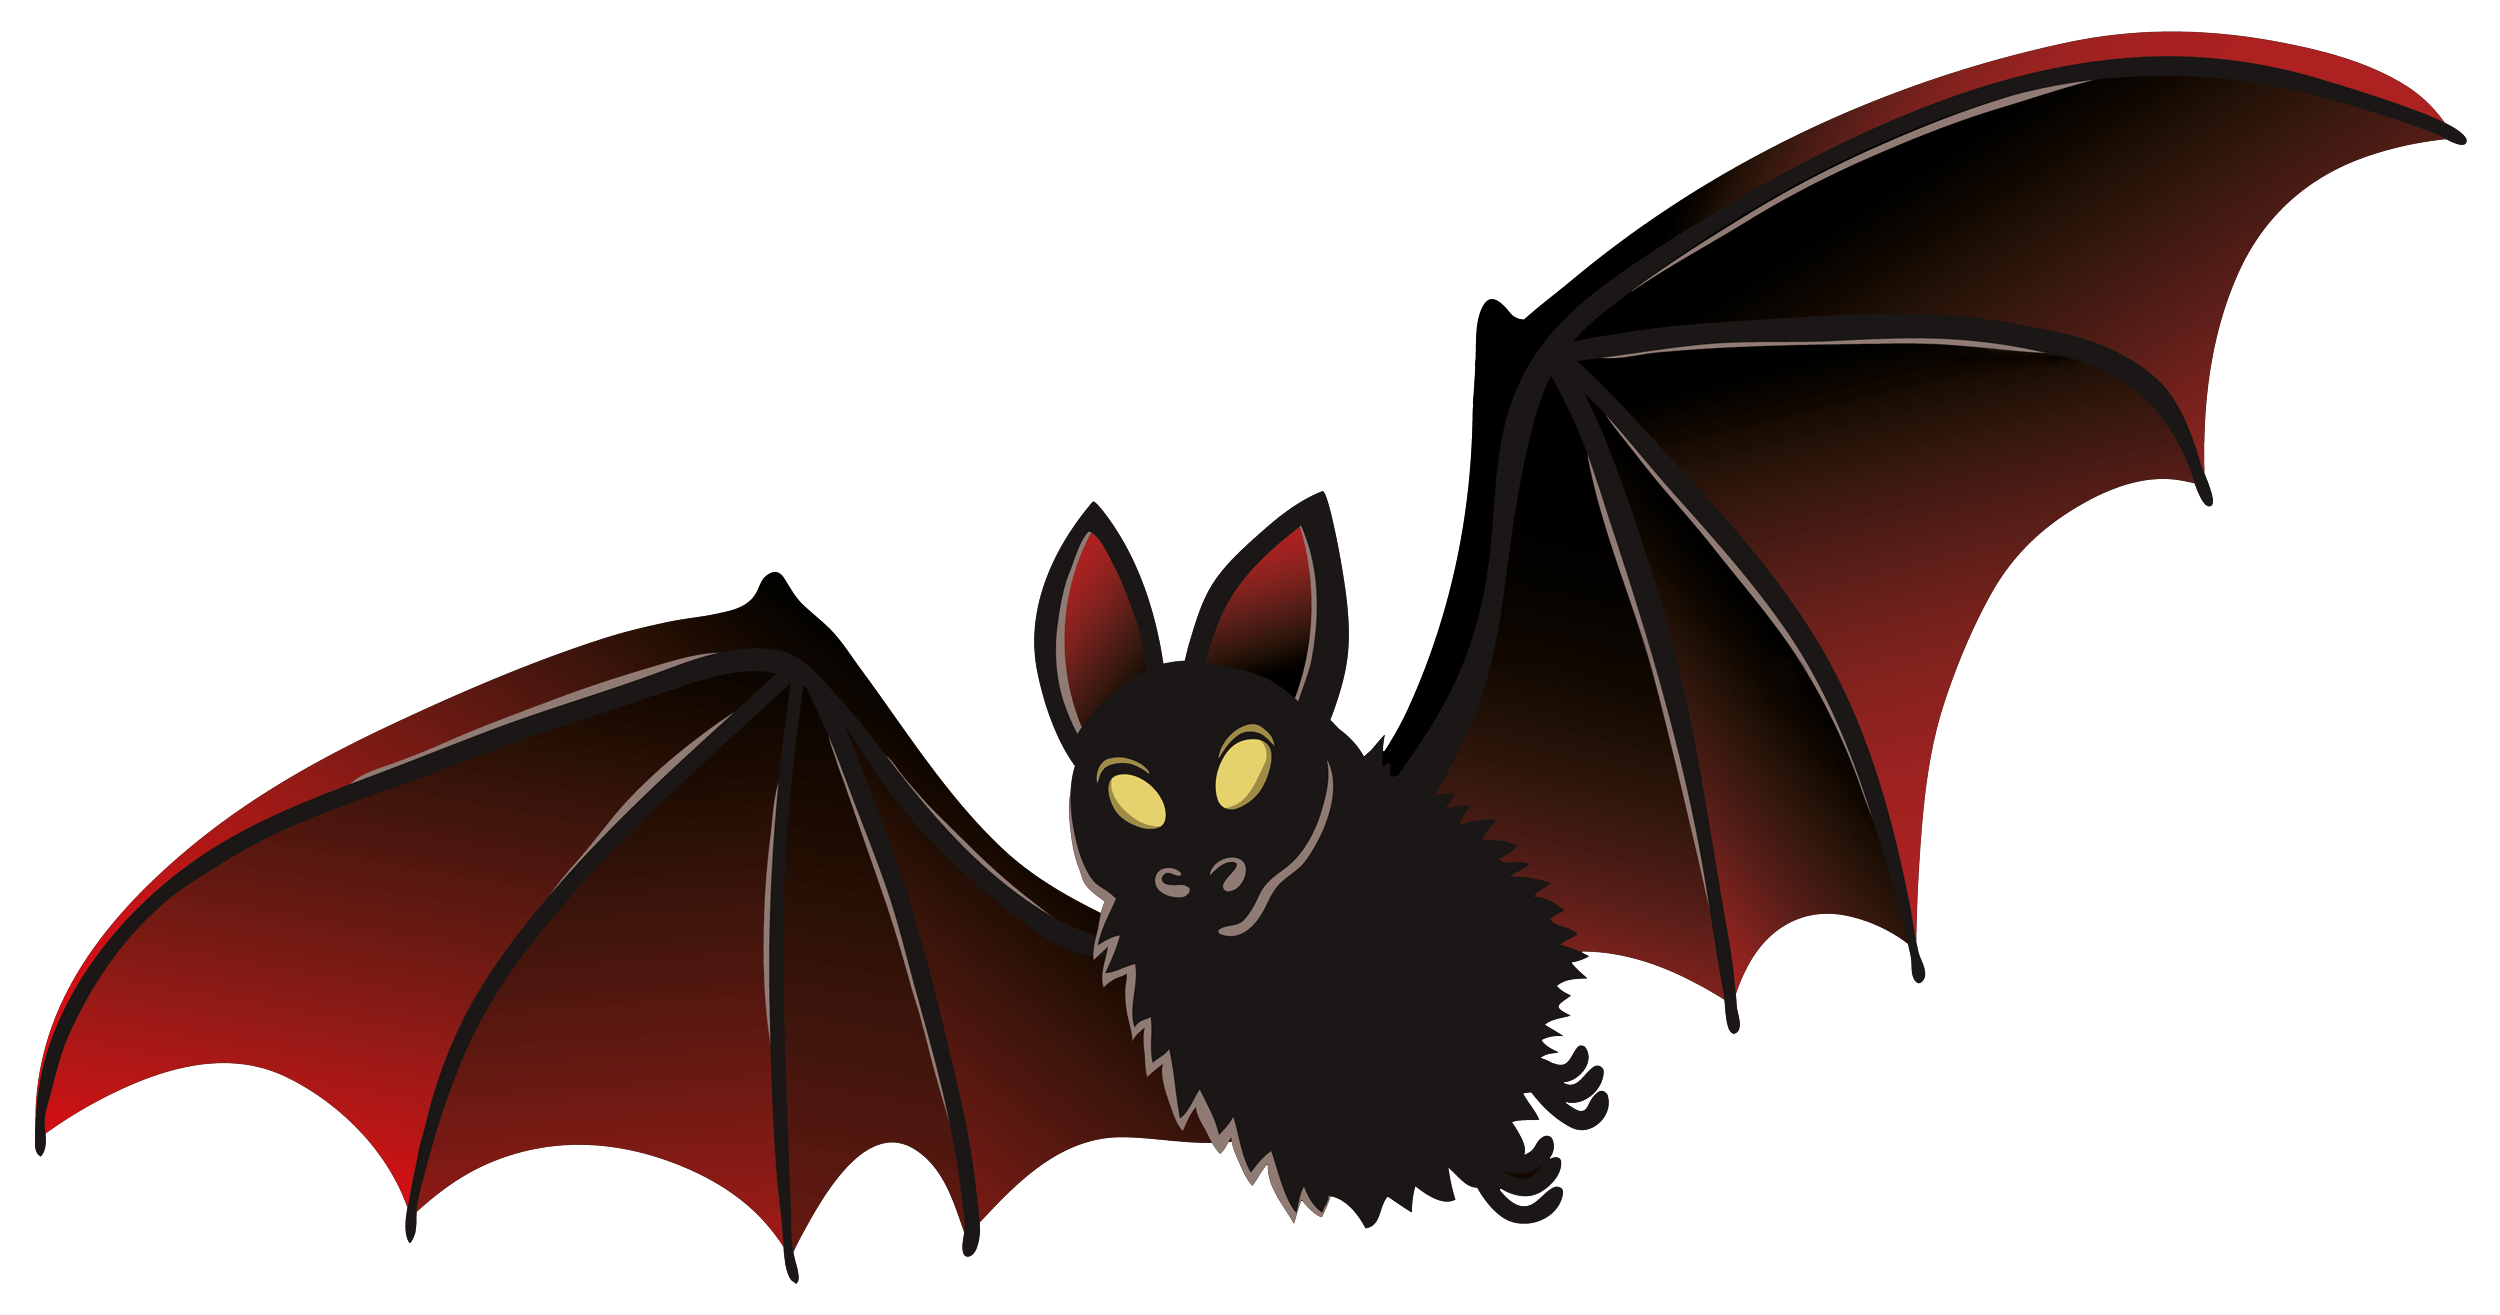 Dark vampire transparent png. Clipart cat bat